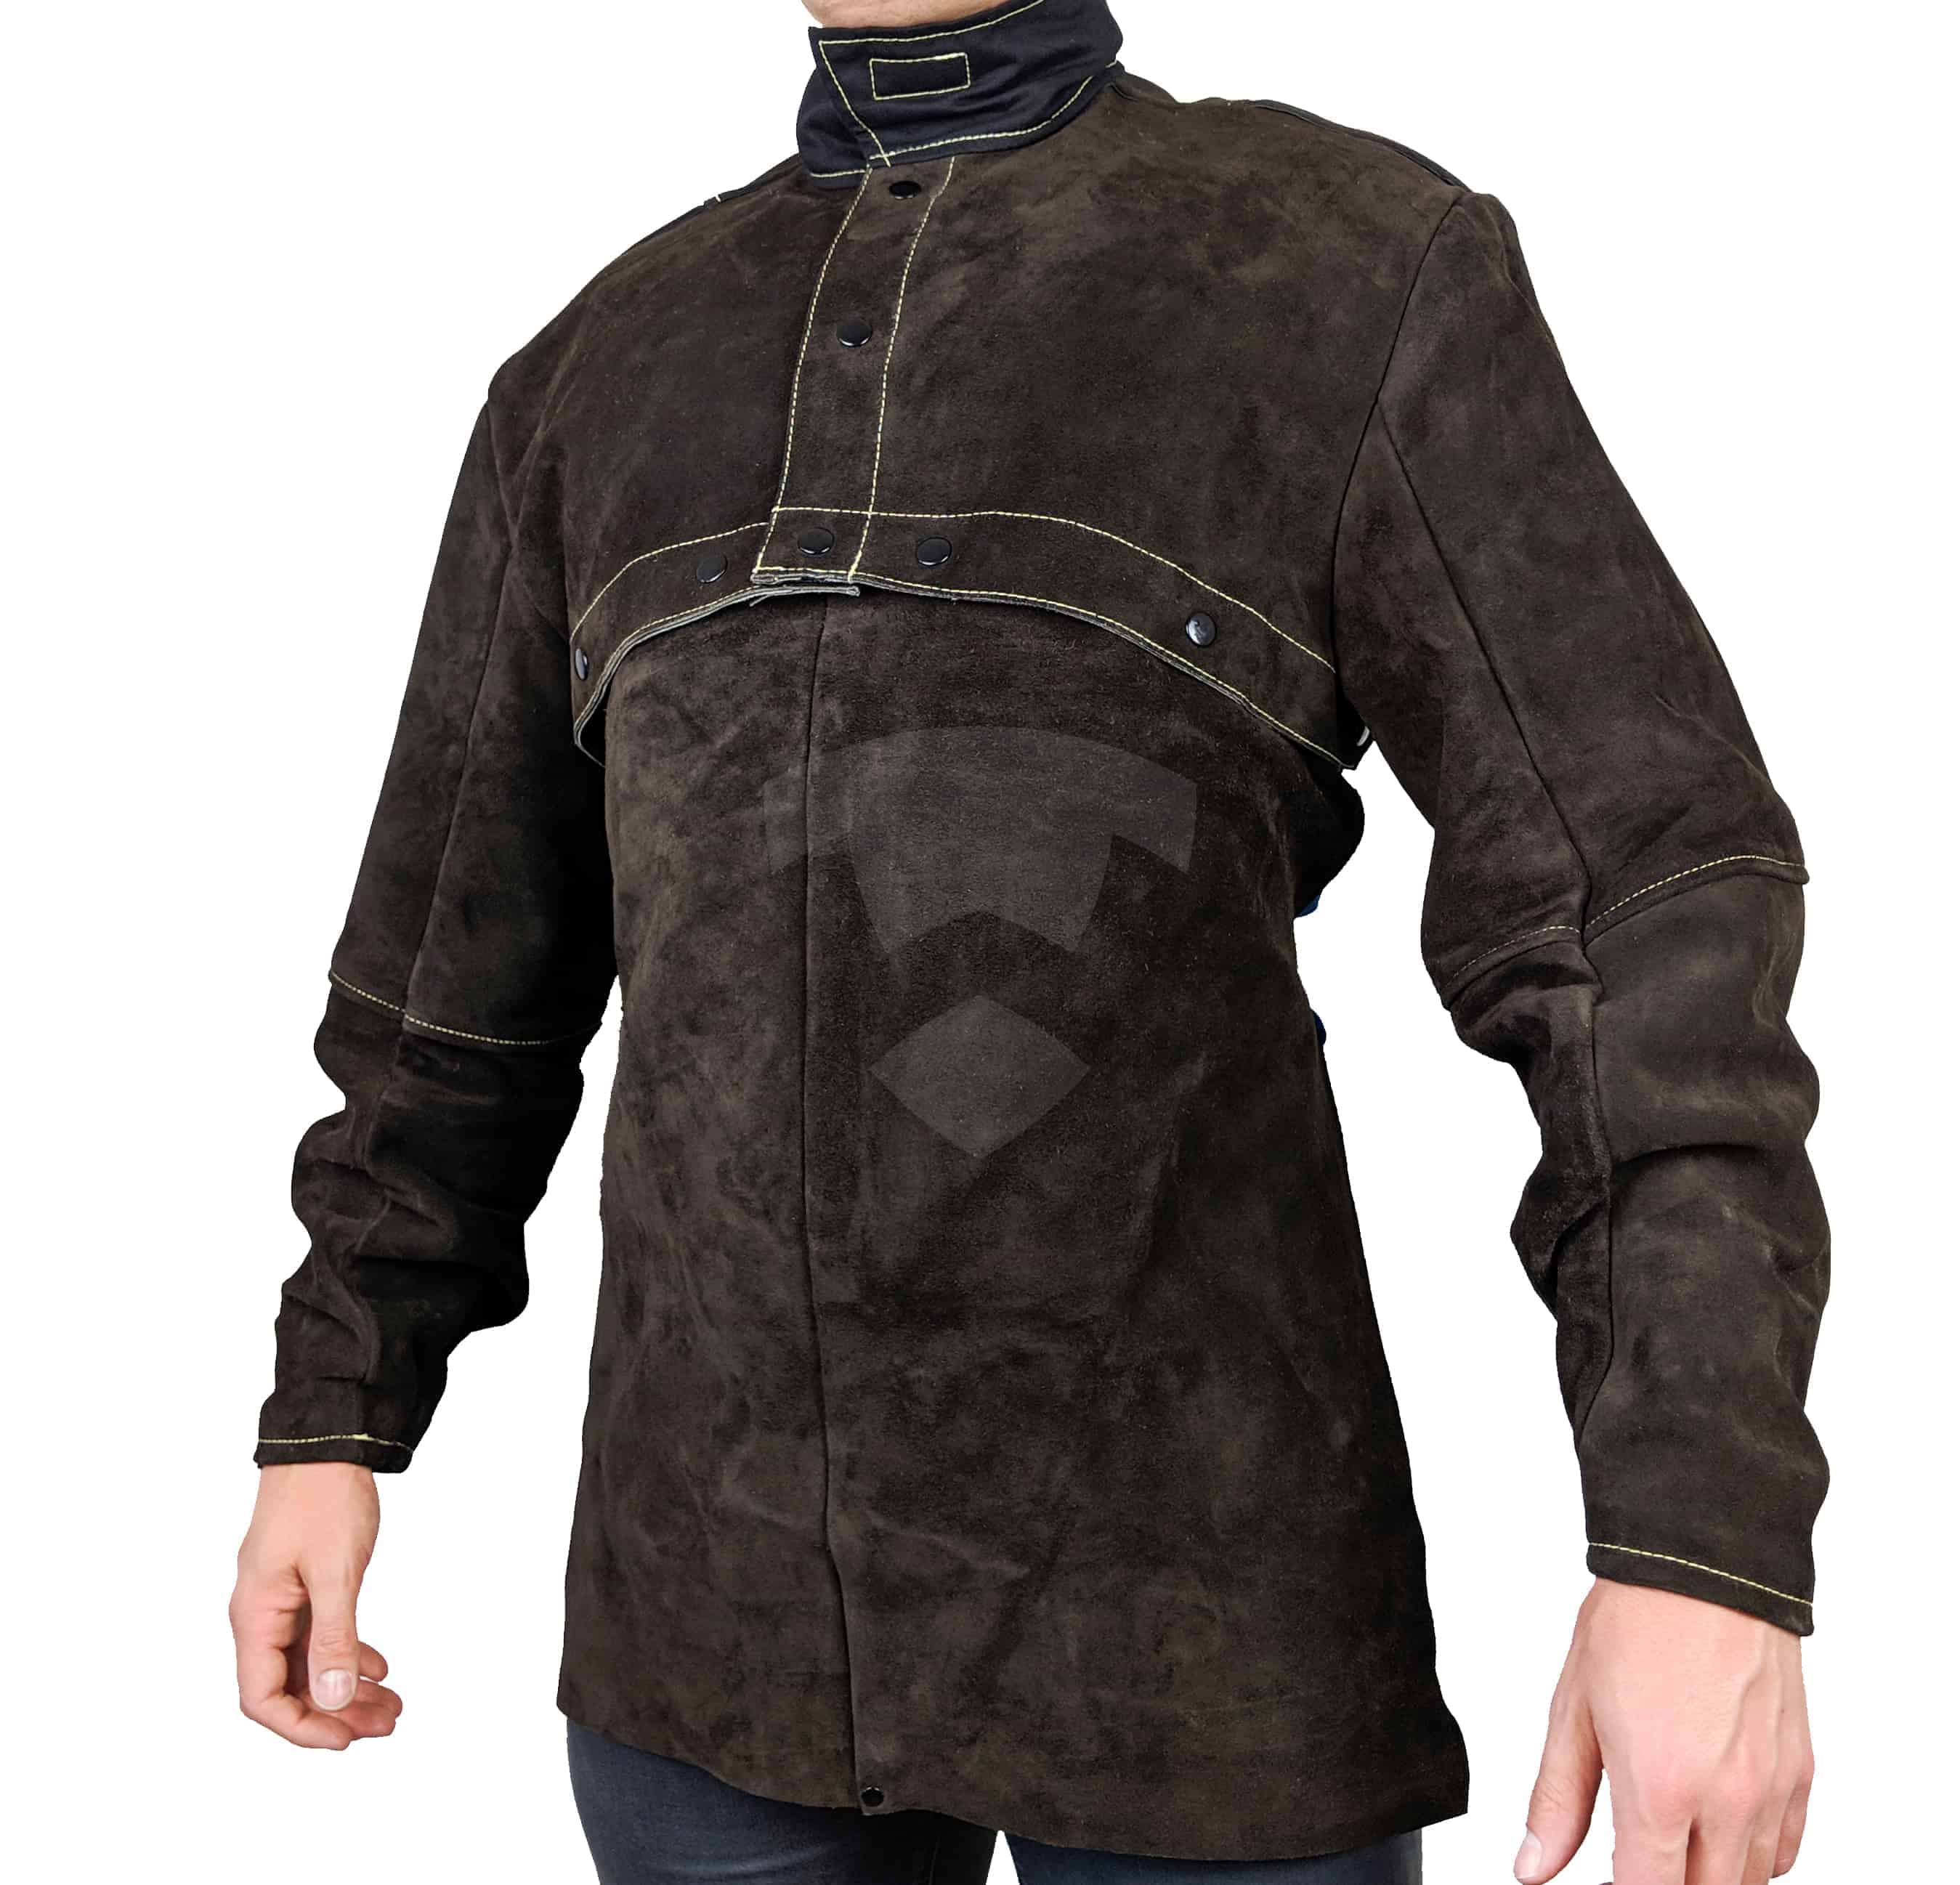 Waylander Welding Cape Sleeves Cowhide With Detachable 20